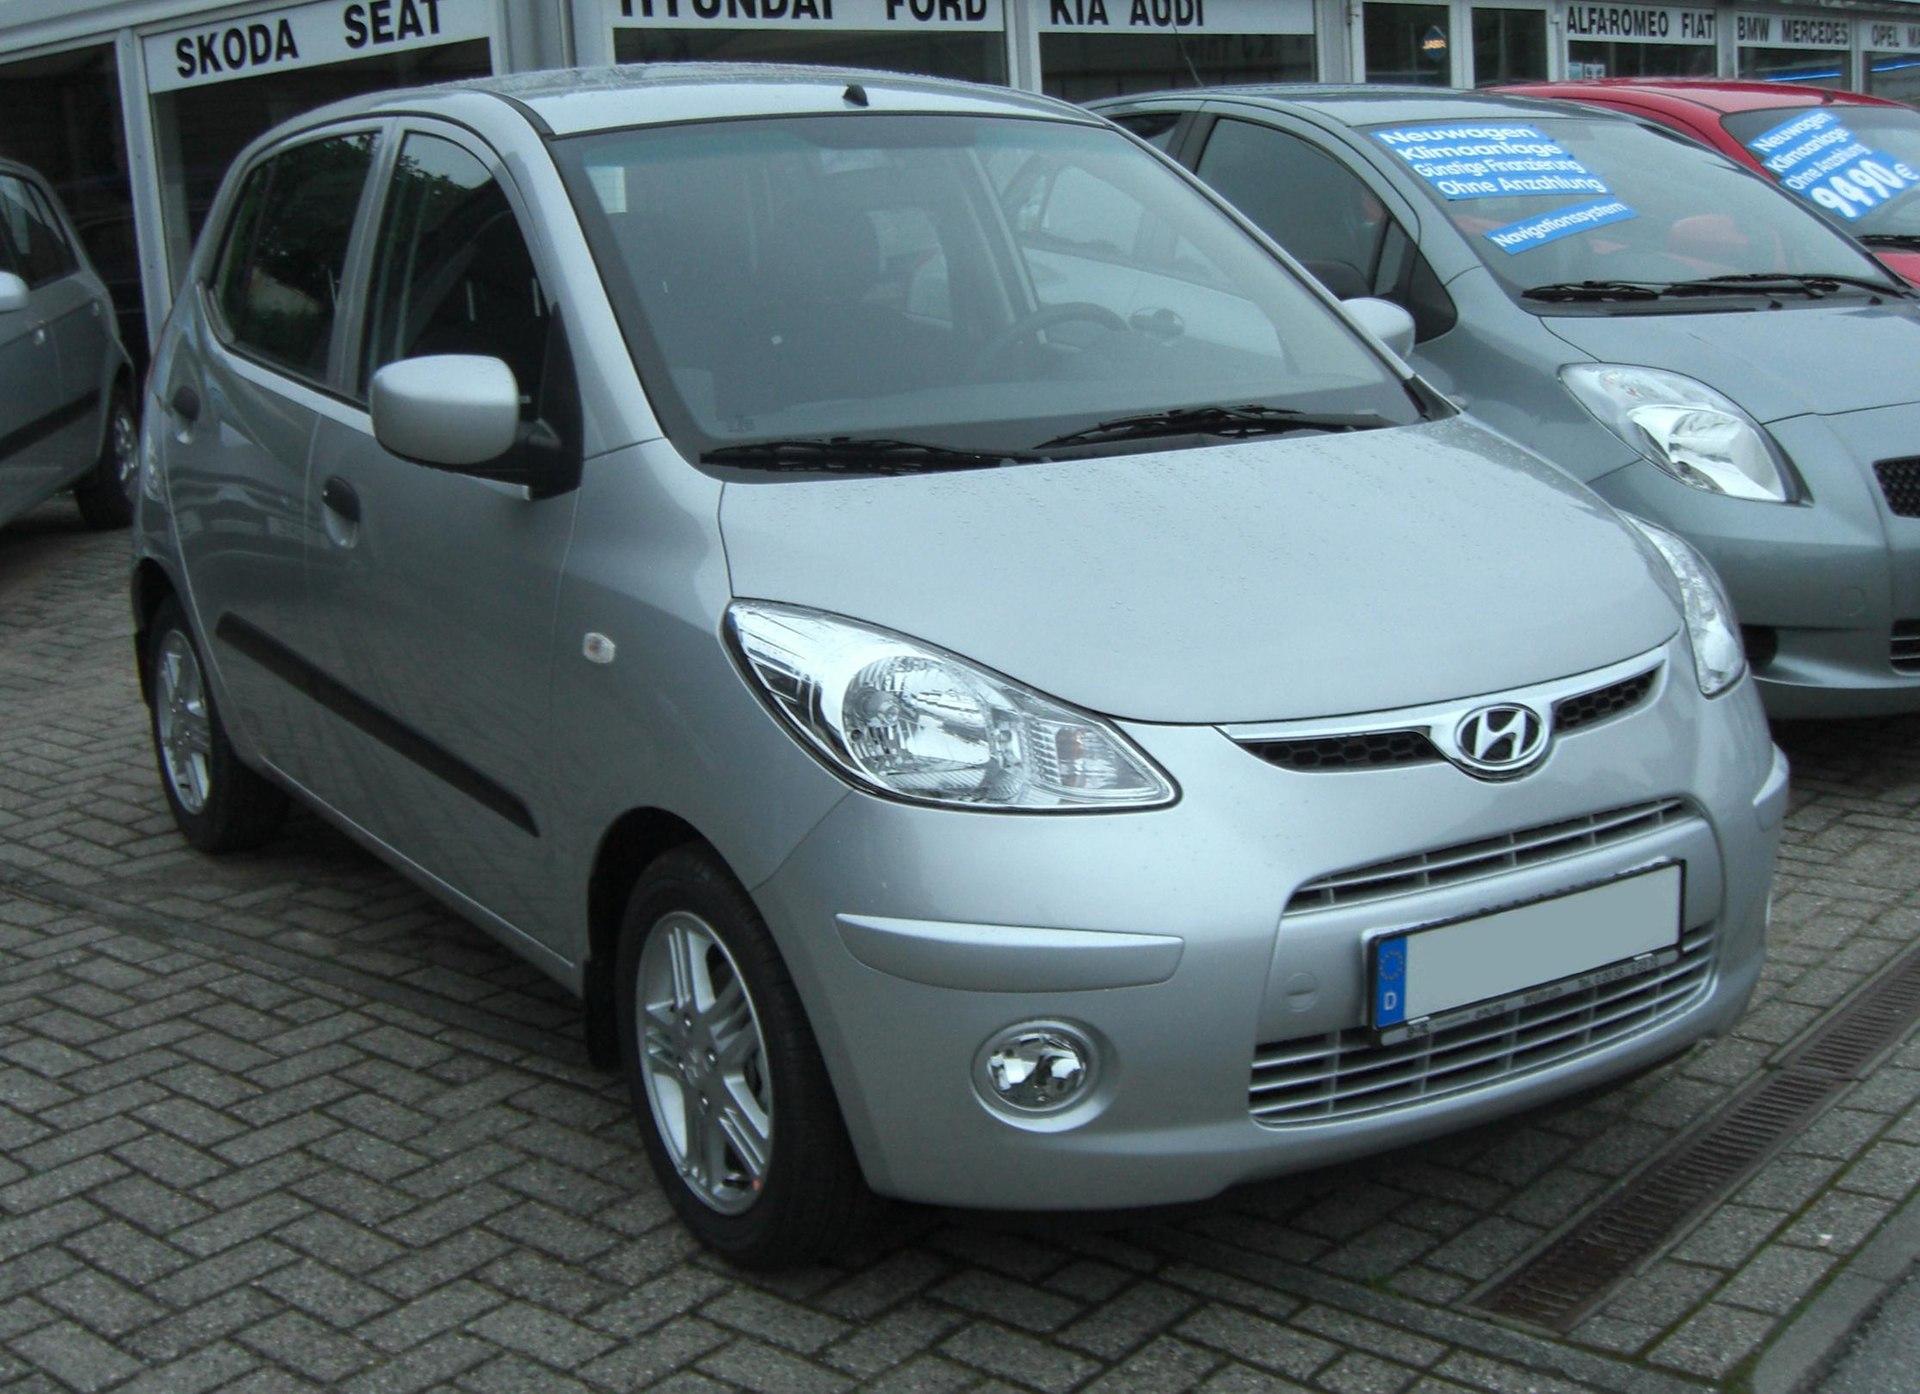 Hyundai i10 - Wikipedia, la enciclopedia libre